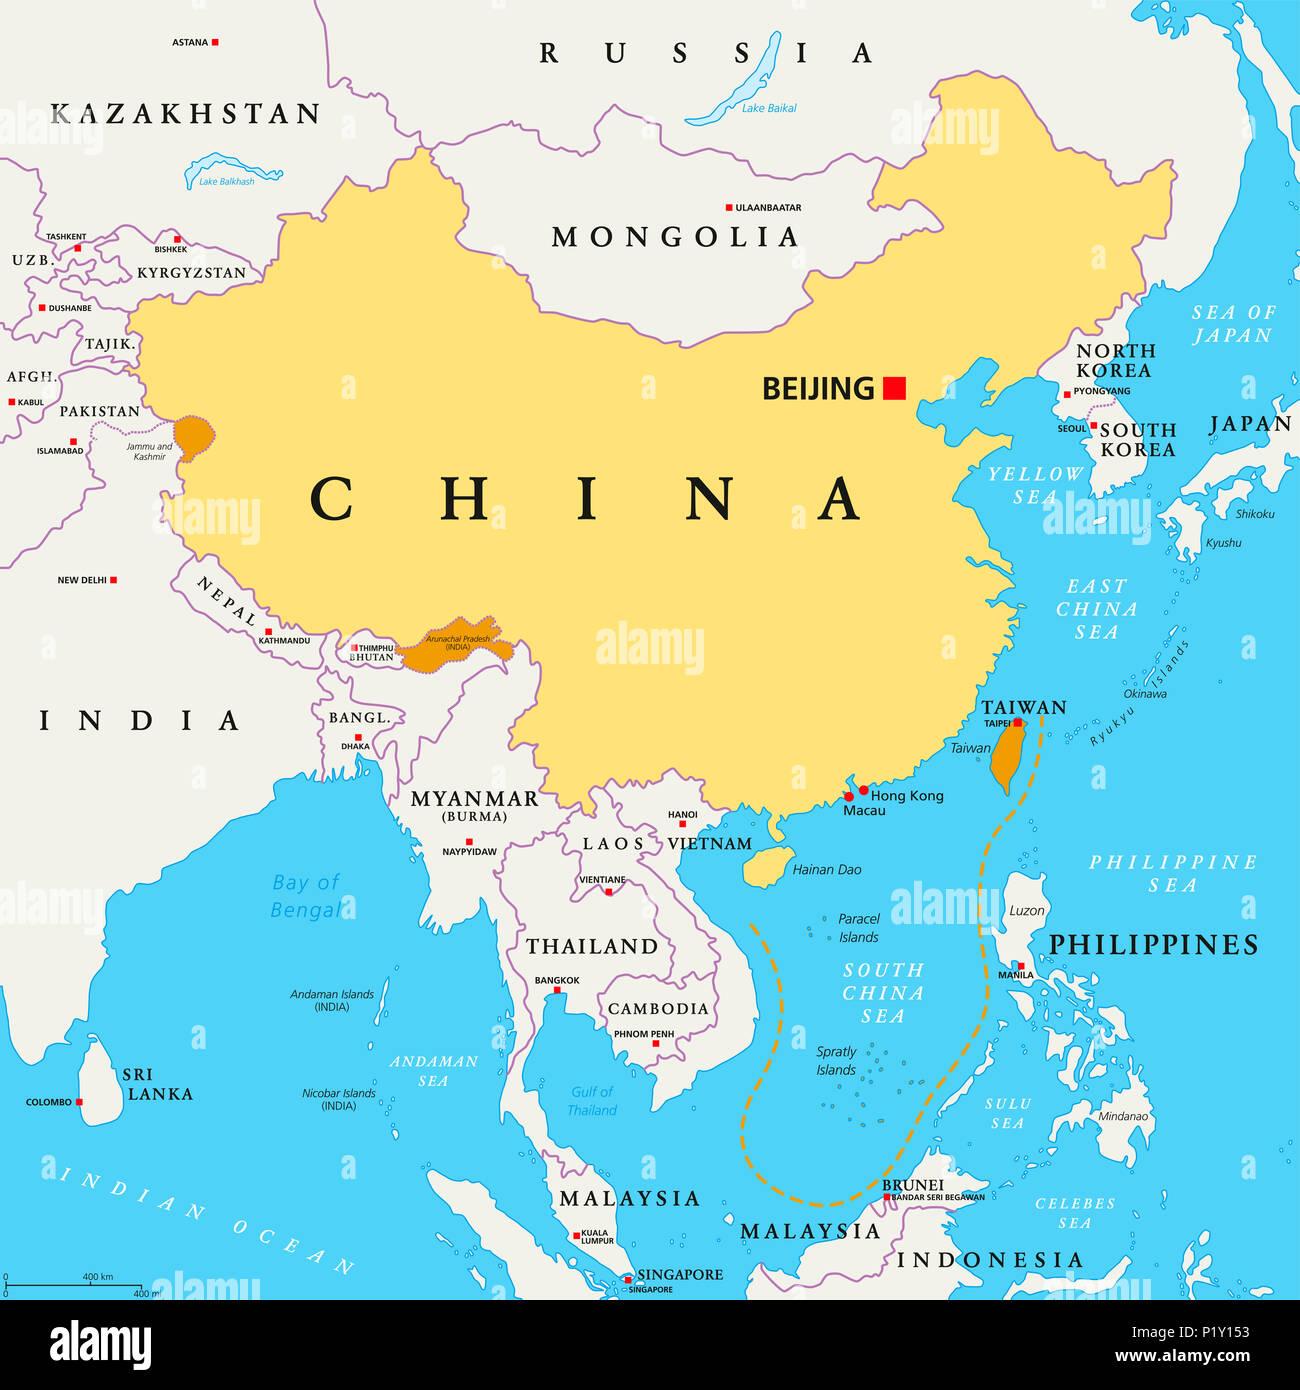 china politische karte Volksrepublik China, VR China, politische Karte. Bereich von China